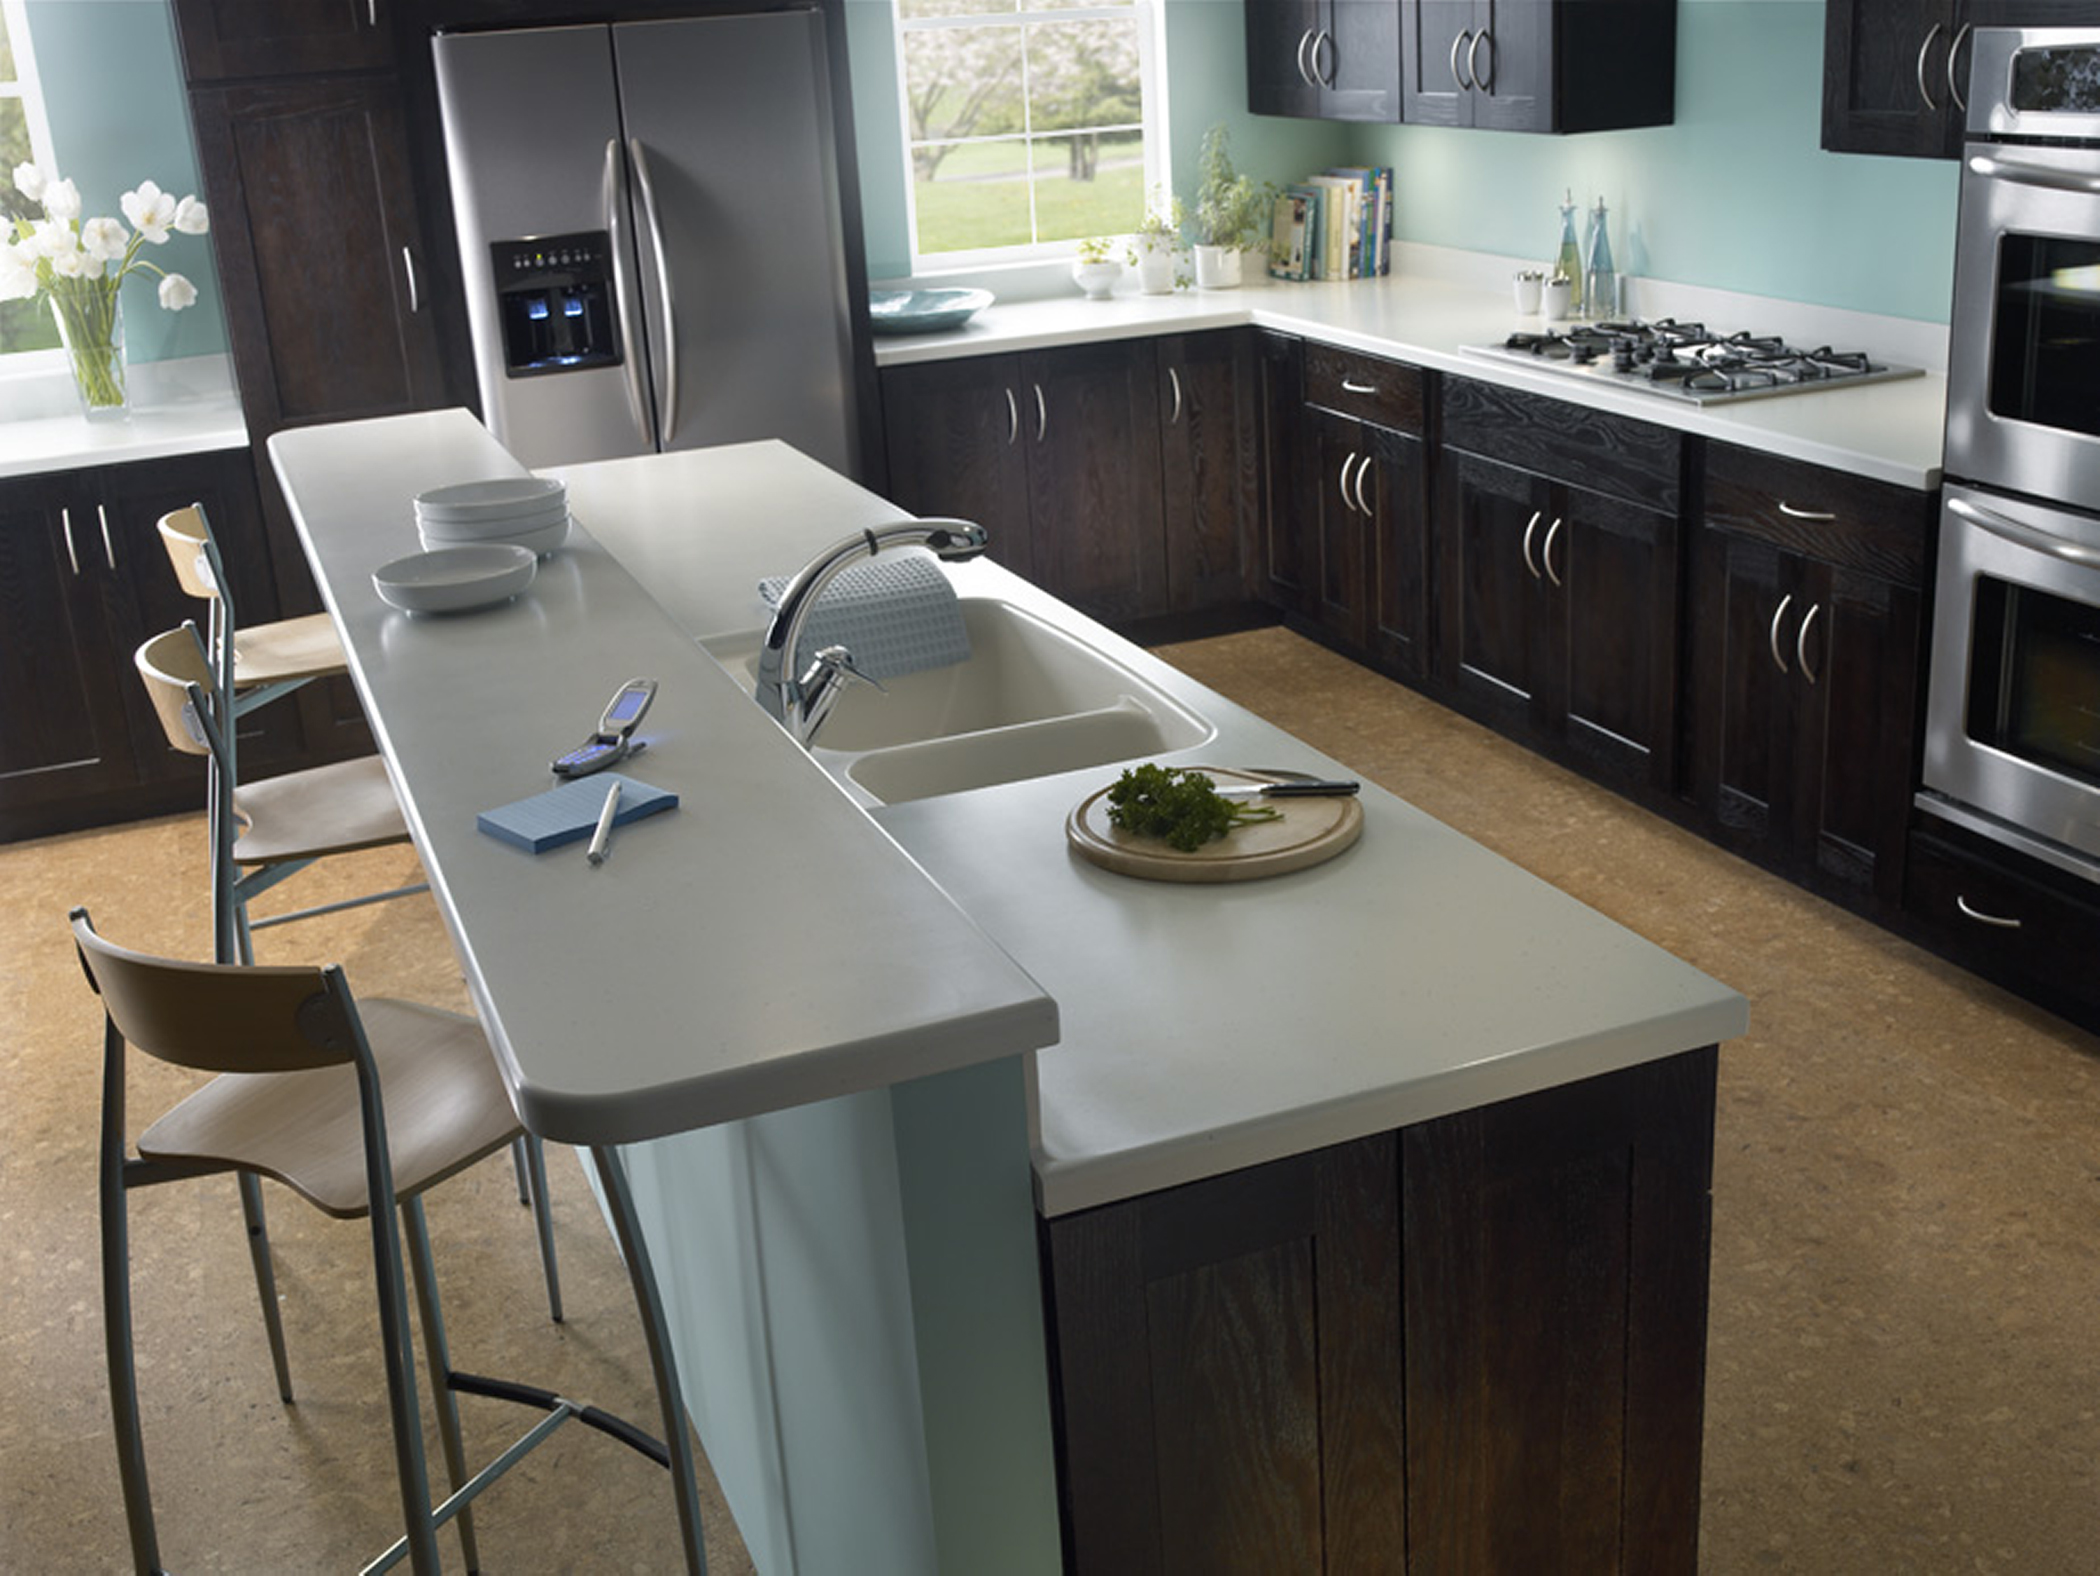 dupont corian countertops design   1st DuPont™ Corian® Design Studios in U.S. Open in ...